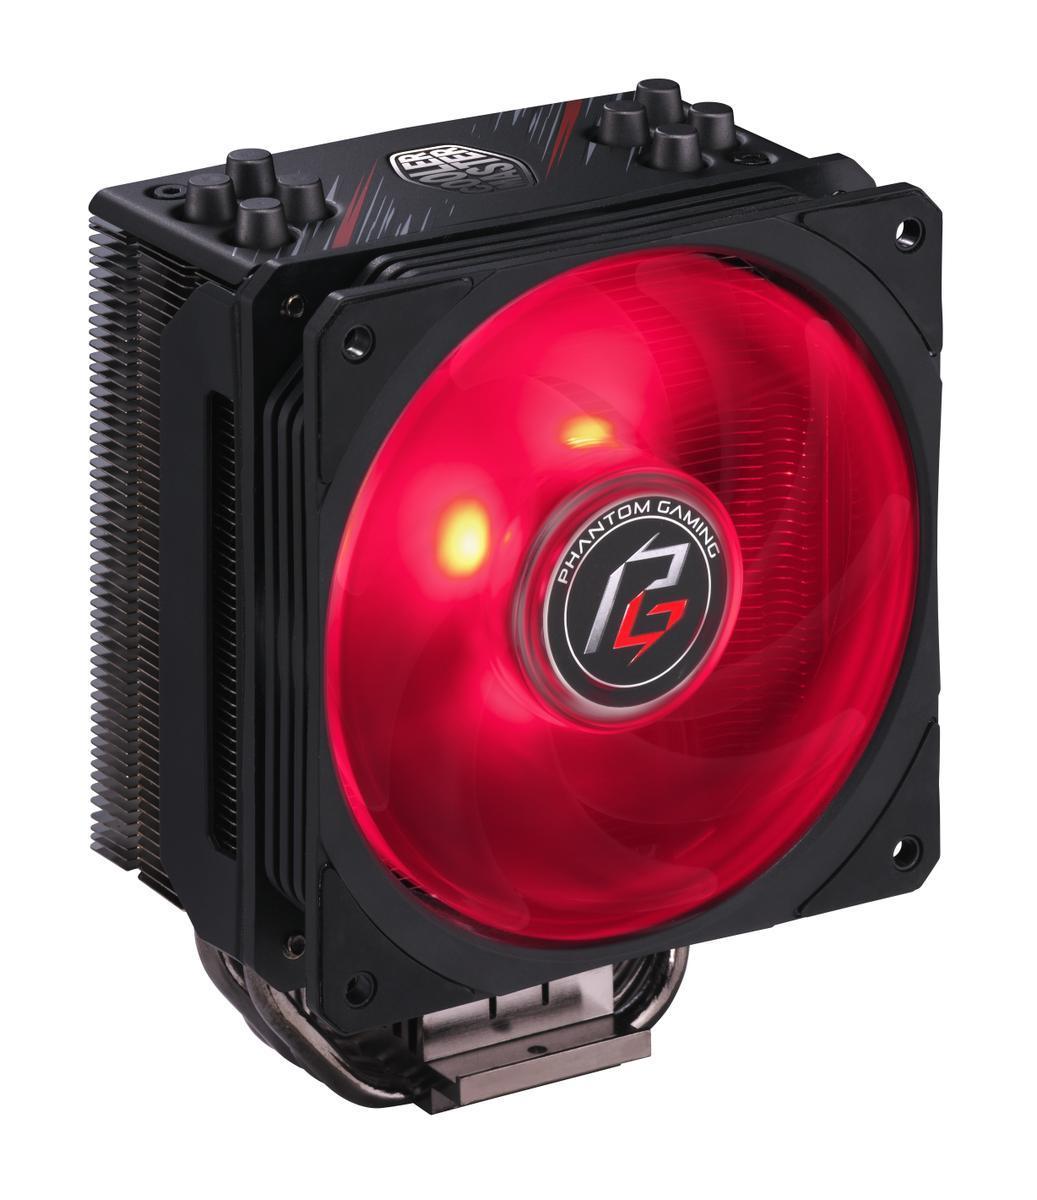 Охладител за процесор Cooler Master Hyper 212 RGB Phantom Gaming Edition, AMD/INTEL